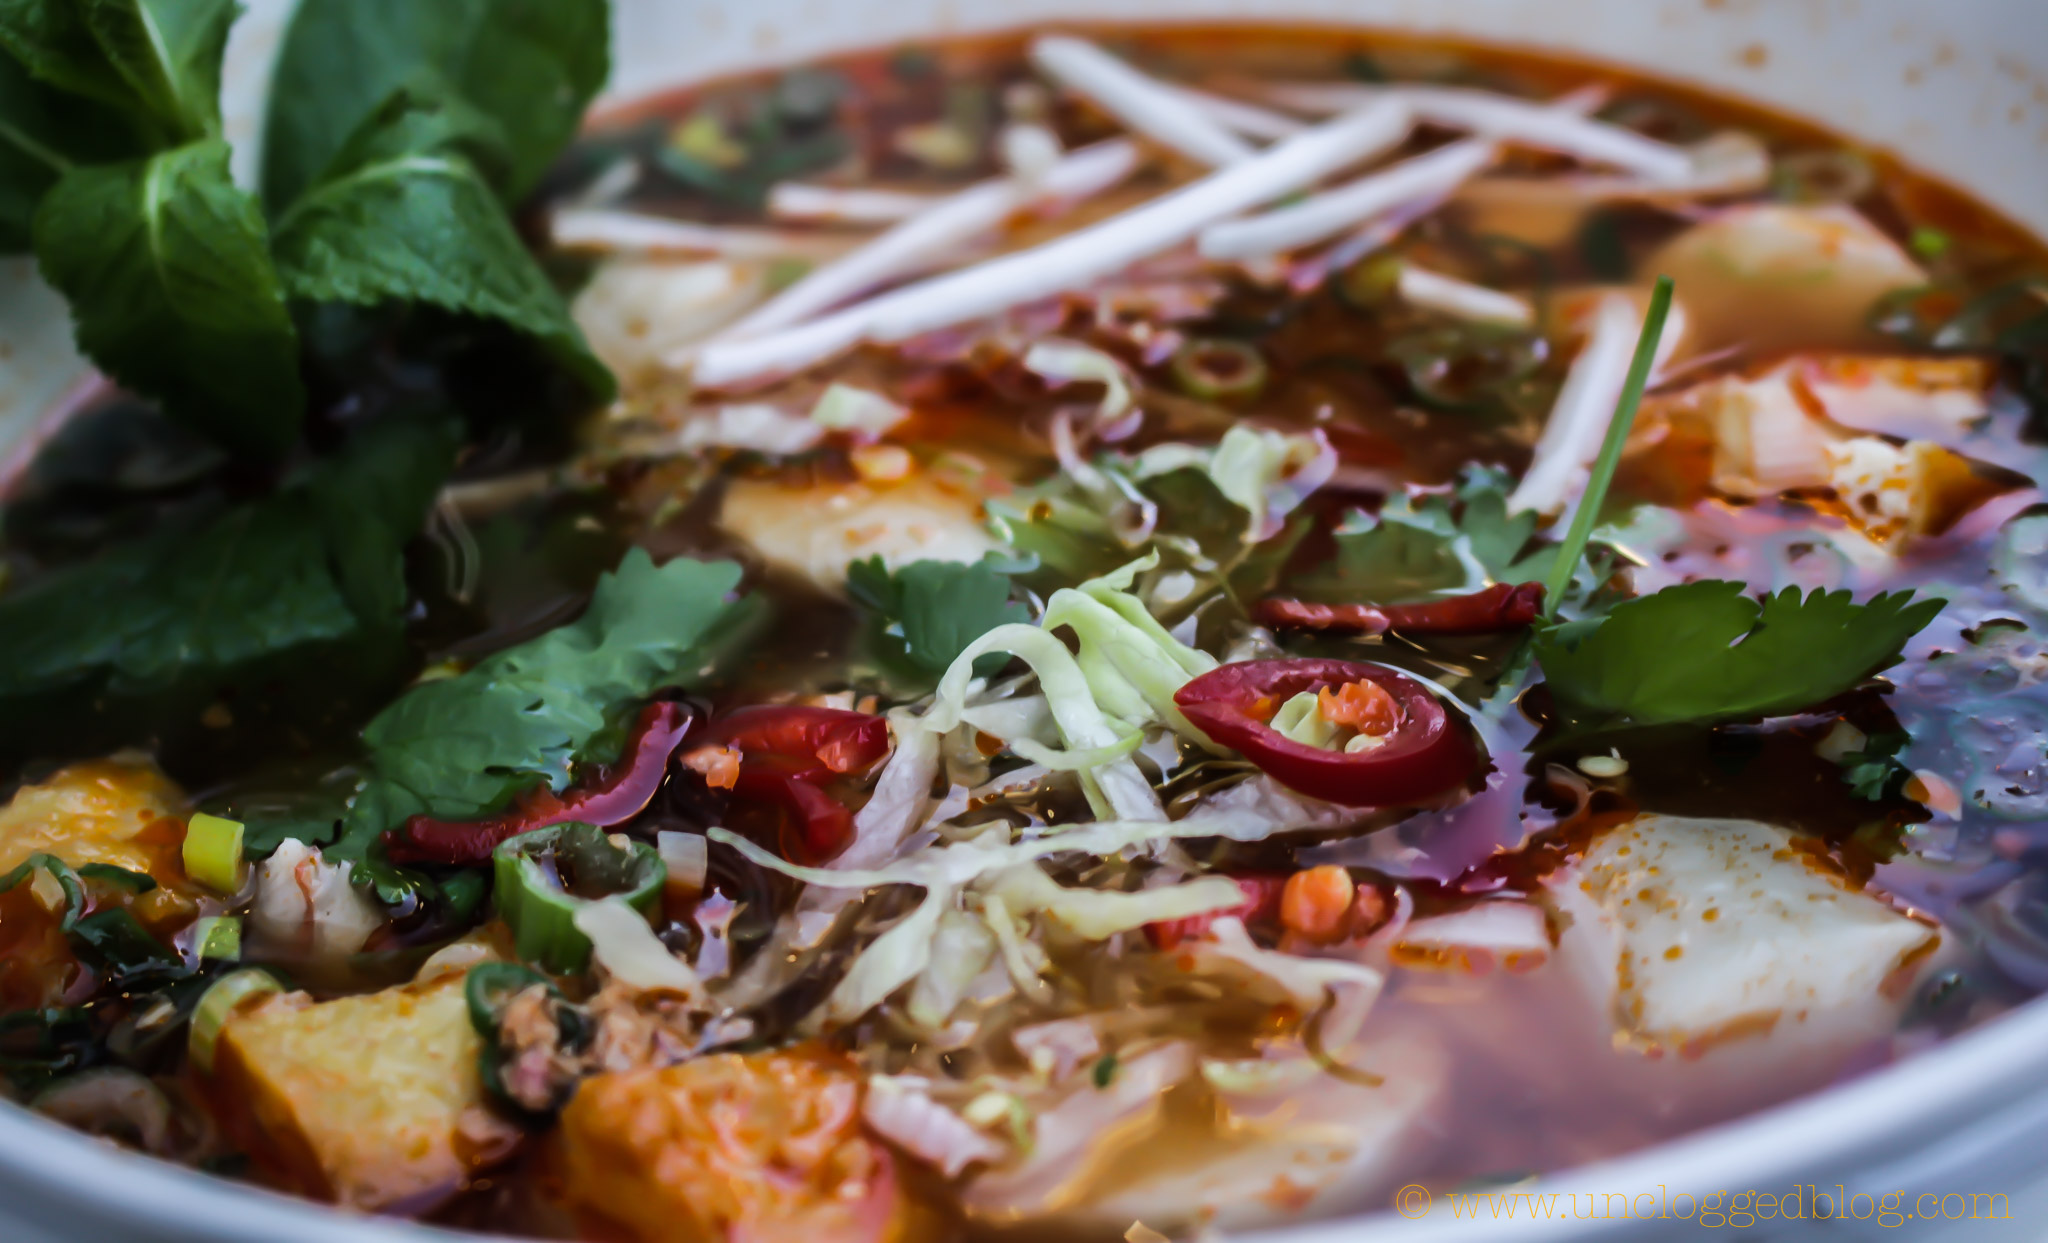 Asian Food Near Heart Of Amsterdam